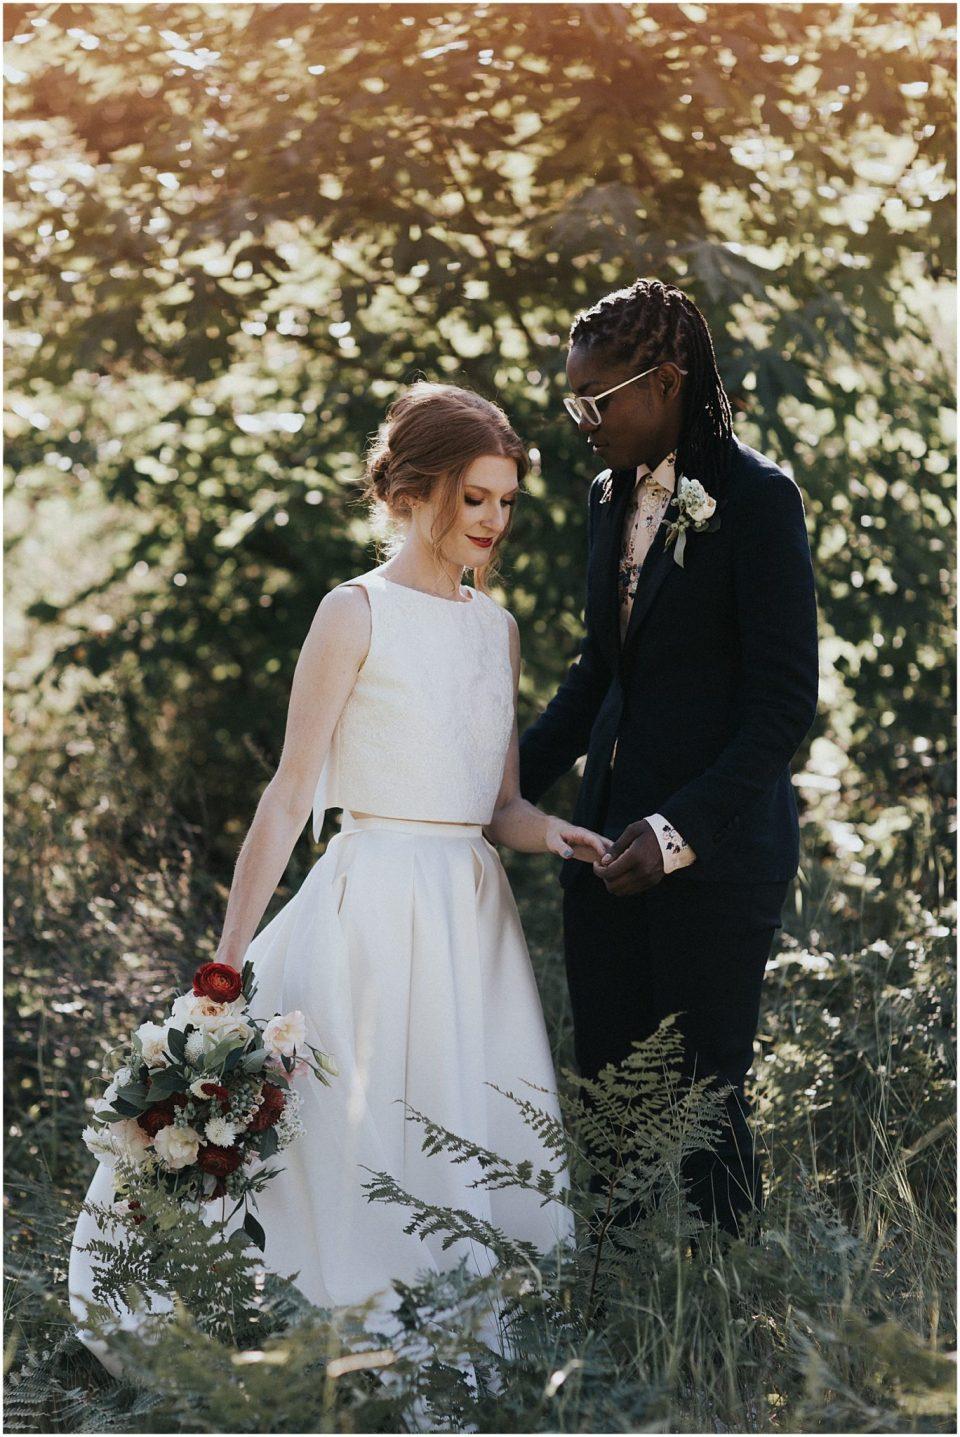 hollis-brittany-sullivan&sullivan-hoodriverwedding (22 of 54)_seattle wedding.jpg